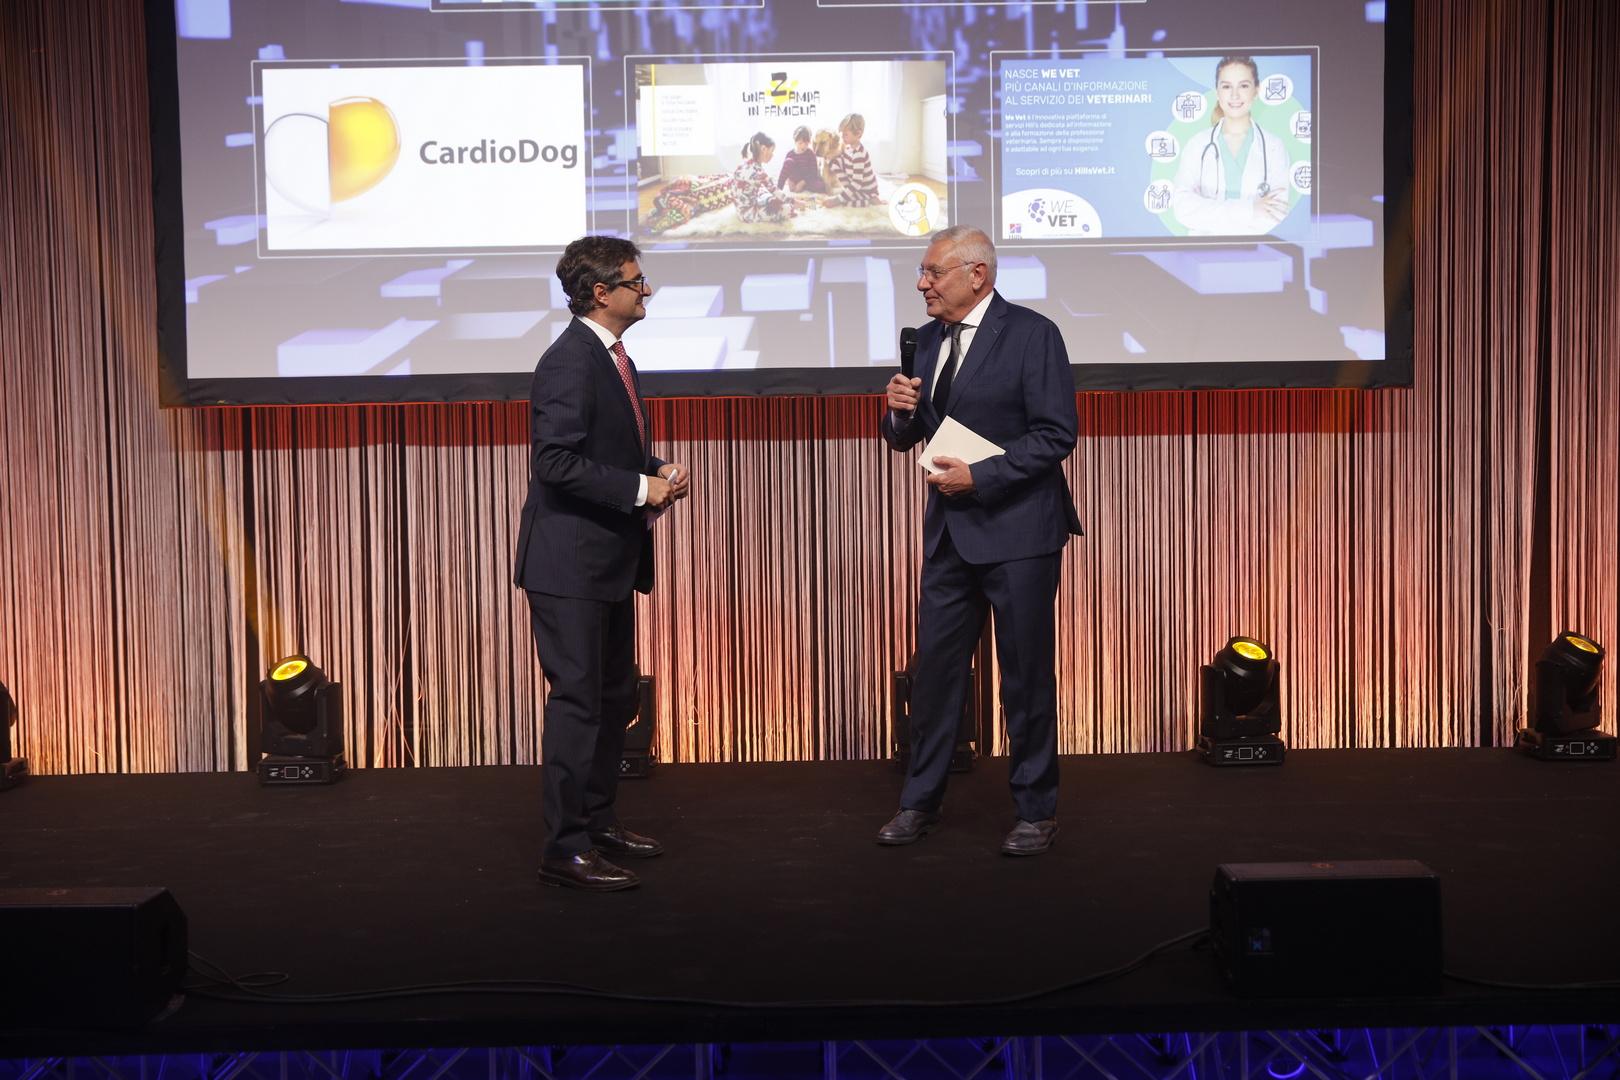 AboutPharma Digital Awards 2019 (74)